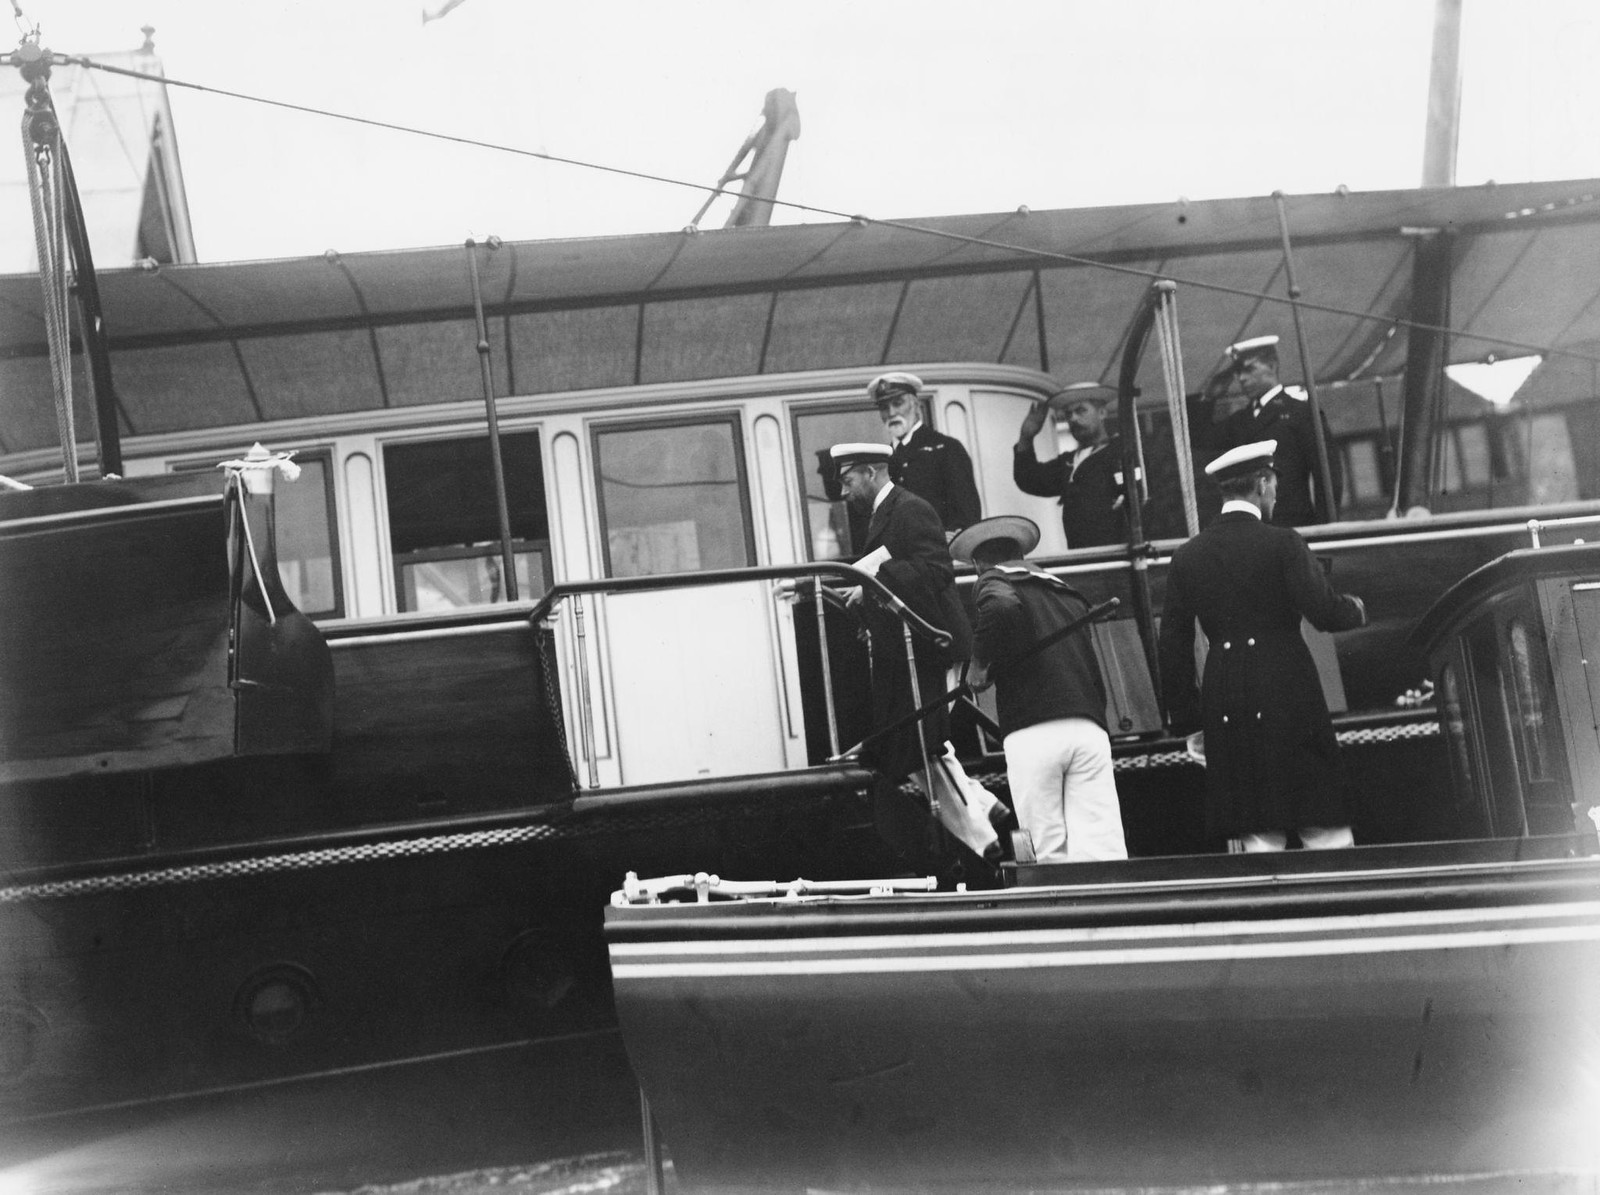 1909. Царь Николай II сходит на берег на острове Уайт во время регаты в Коузе